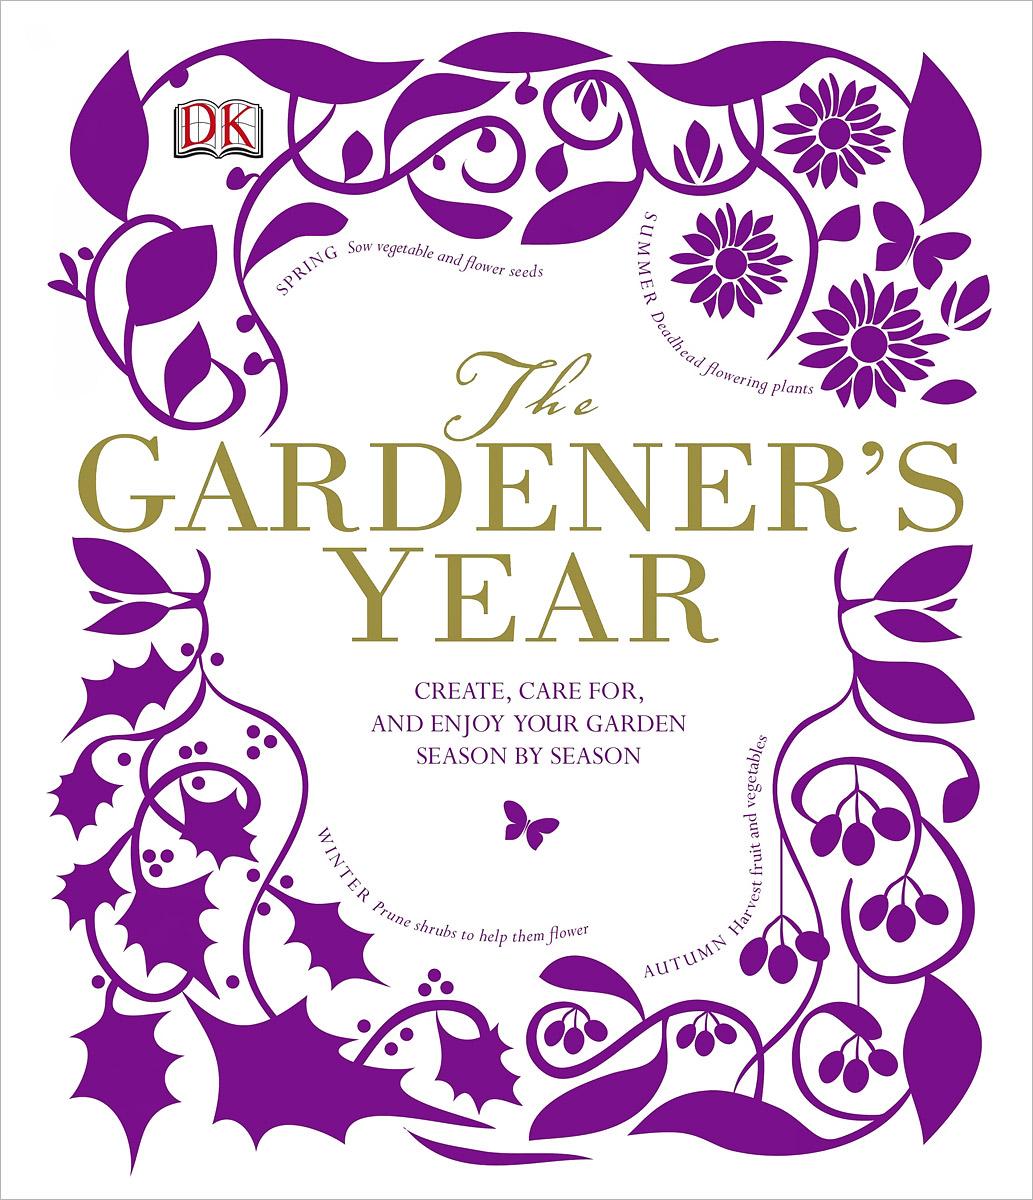 The Gardener's Year spring in the garden flowers and seedlings